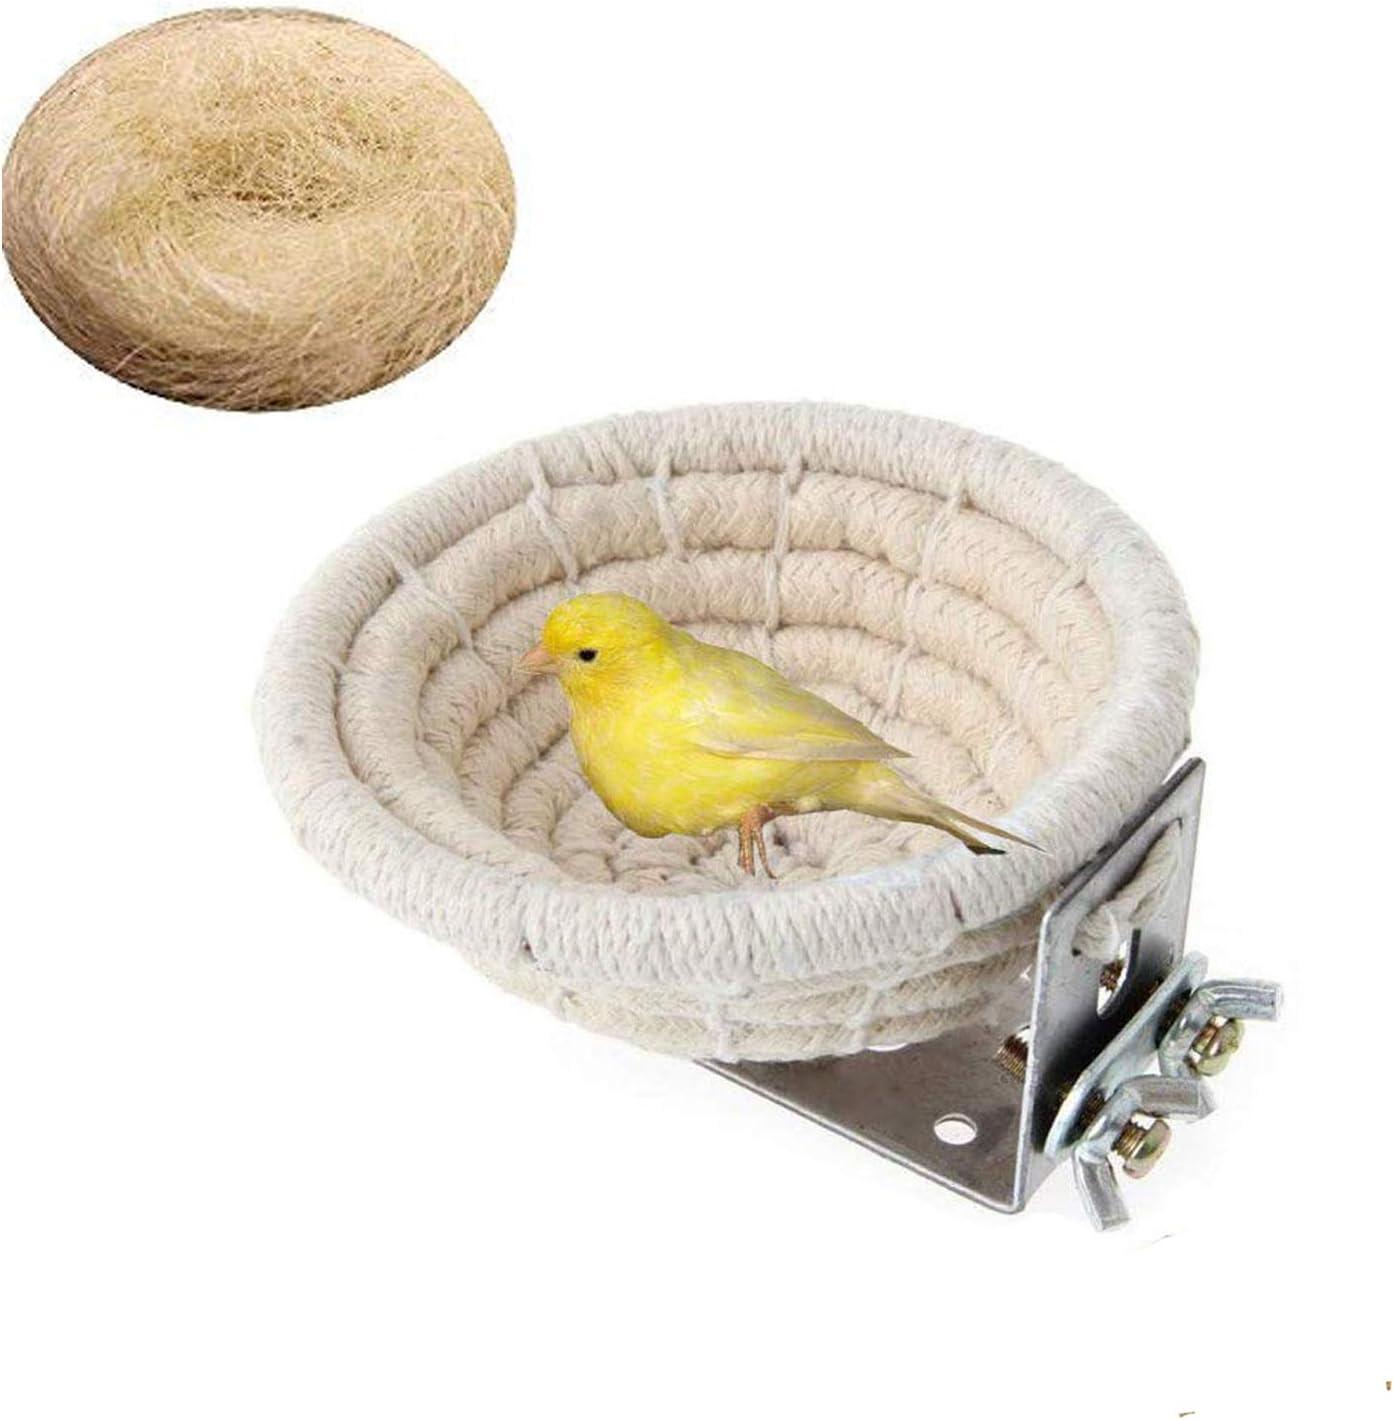 Bird Nest Parakeet Handmade Cotton Max 65% OFF Hemp 2021 Nests Rope Weave Bi